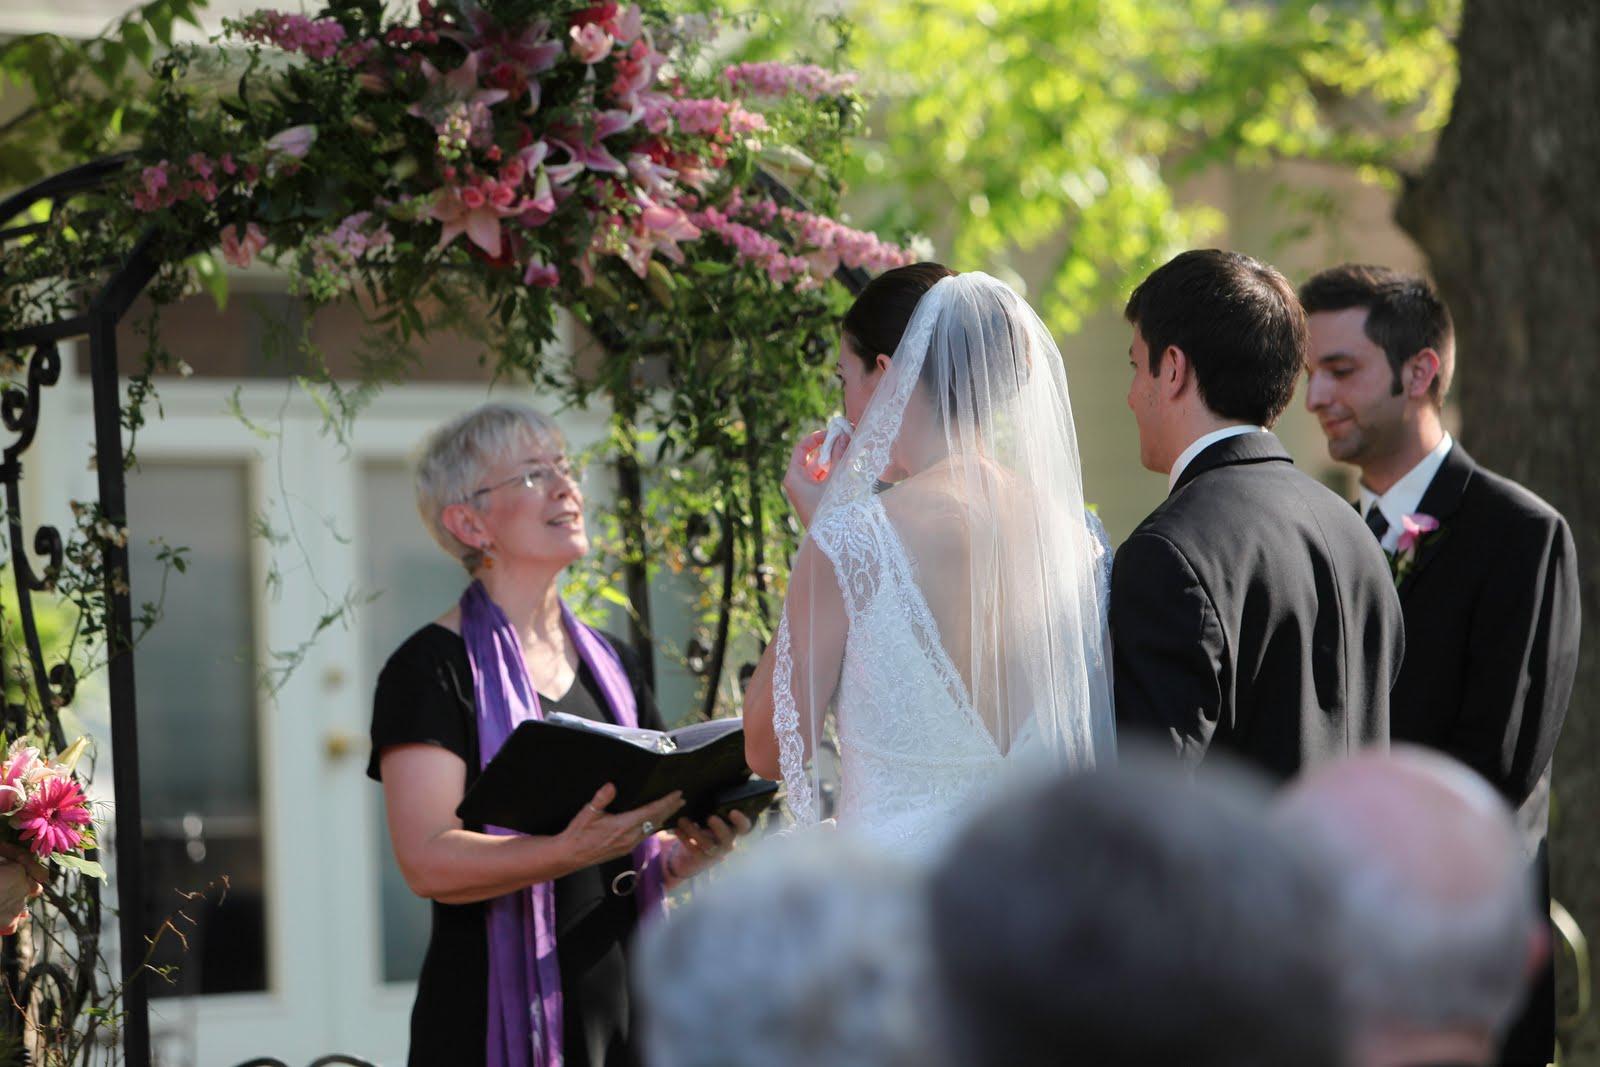 http://2.bp.blogspot.com/_8HVSUu9nCfI/TM62Jq8XKCI/AAAAAAAABSg/o62IXVmi0Go/s1600/Rev+Robin+Renteria+Ryan+and+Jenna+vows+and+The+Matthews+House.jpg